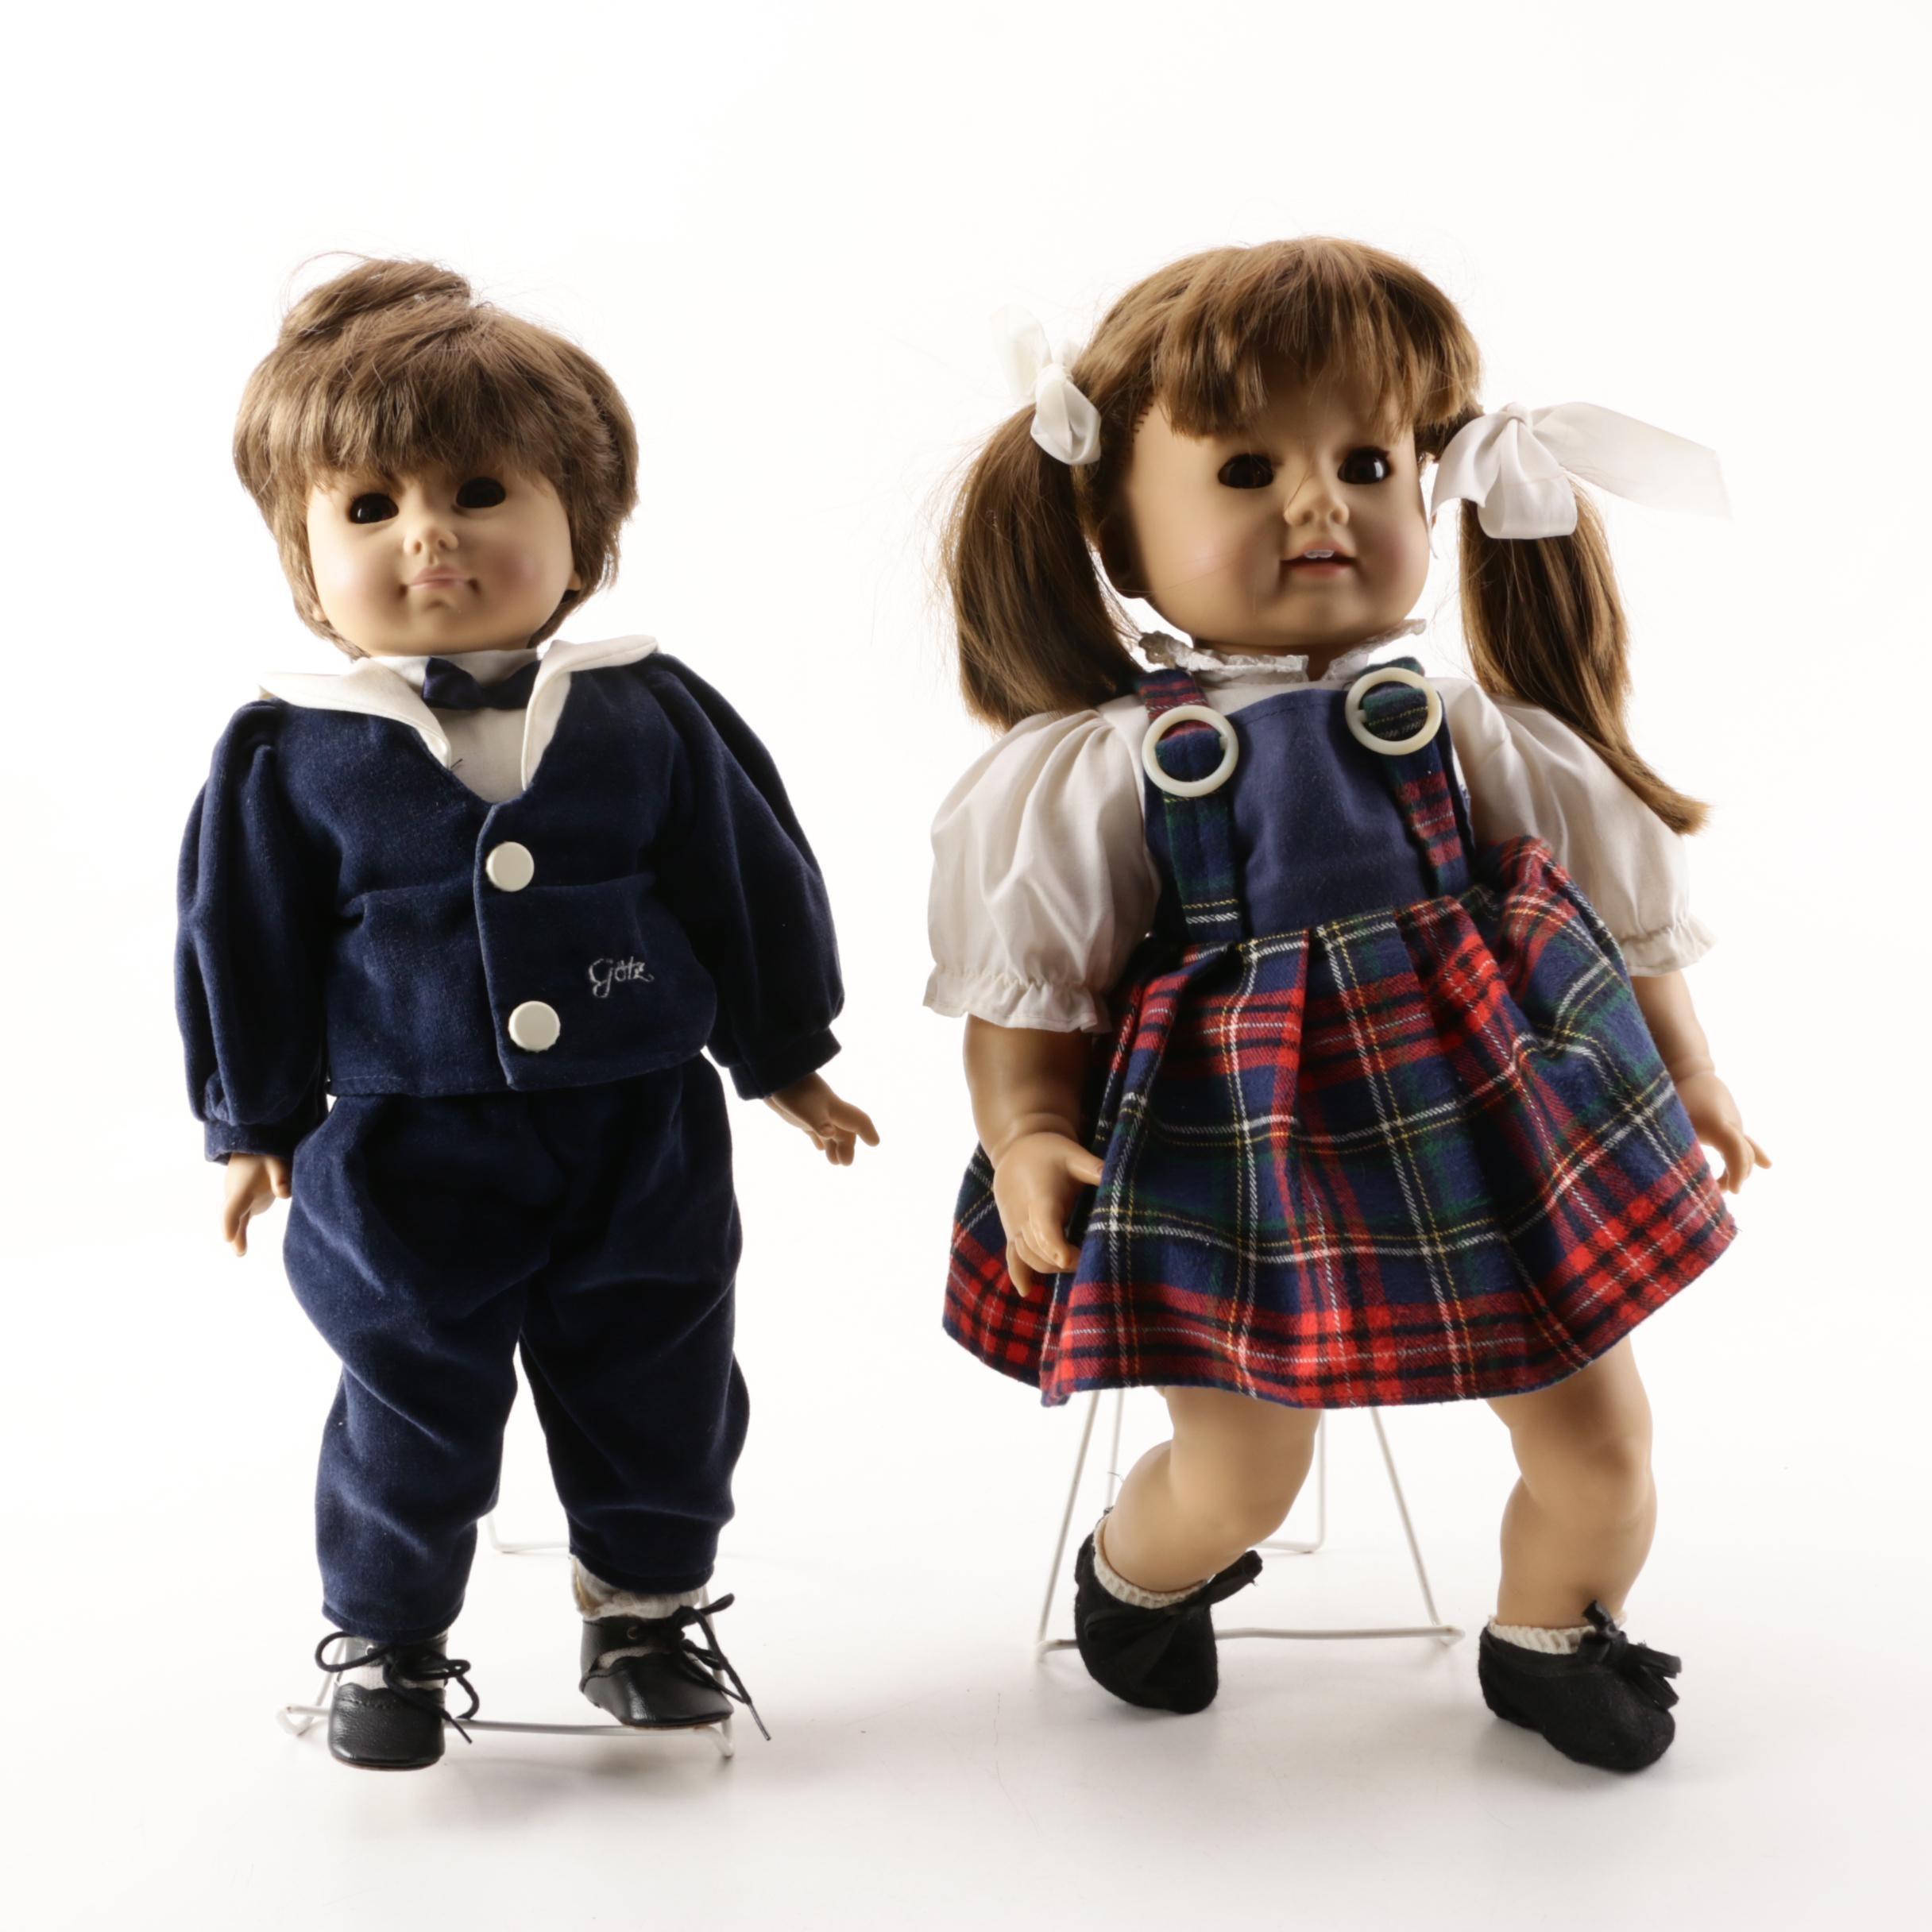 Vintage Vinyl Play Dolls Attributed to Götz